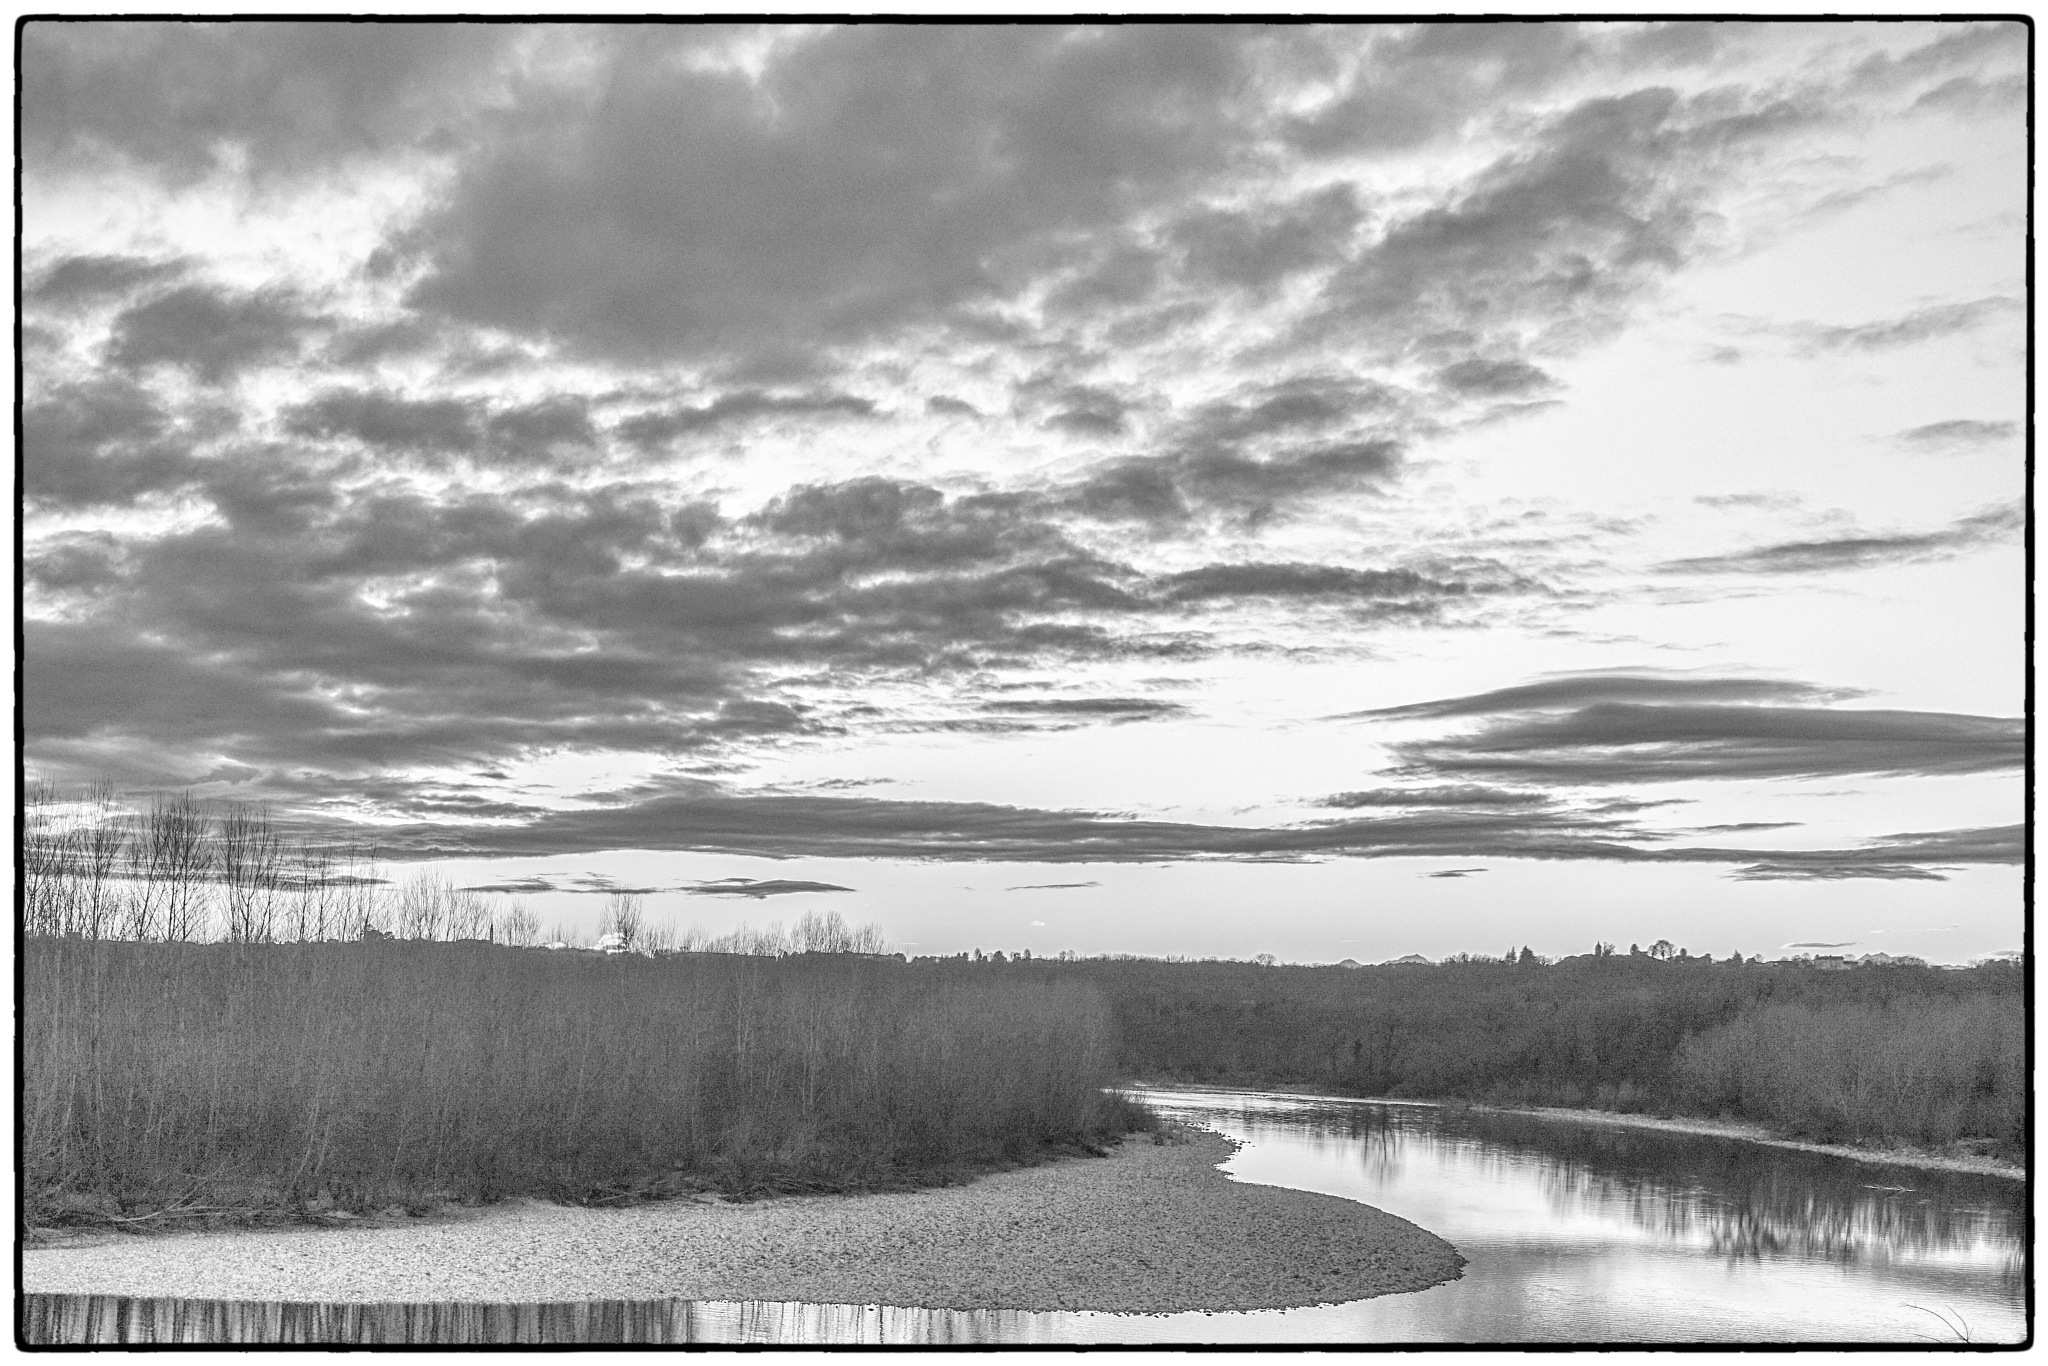 tramonto in bianco e nero by bcorech